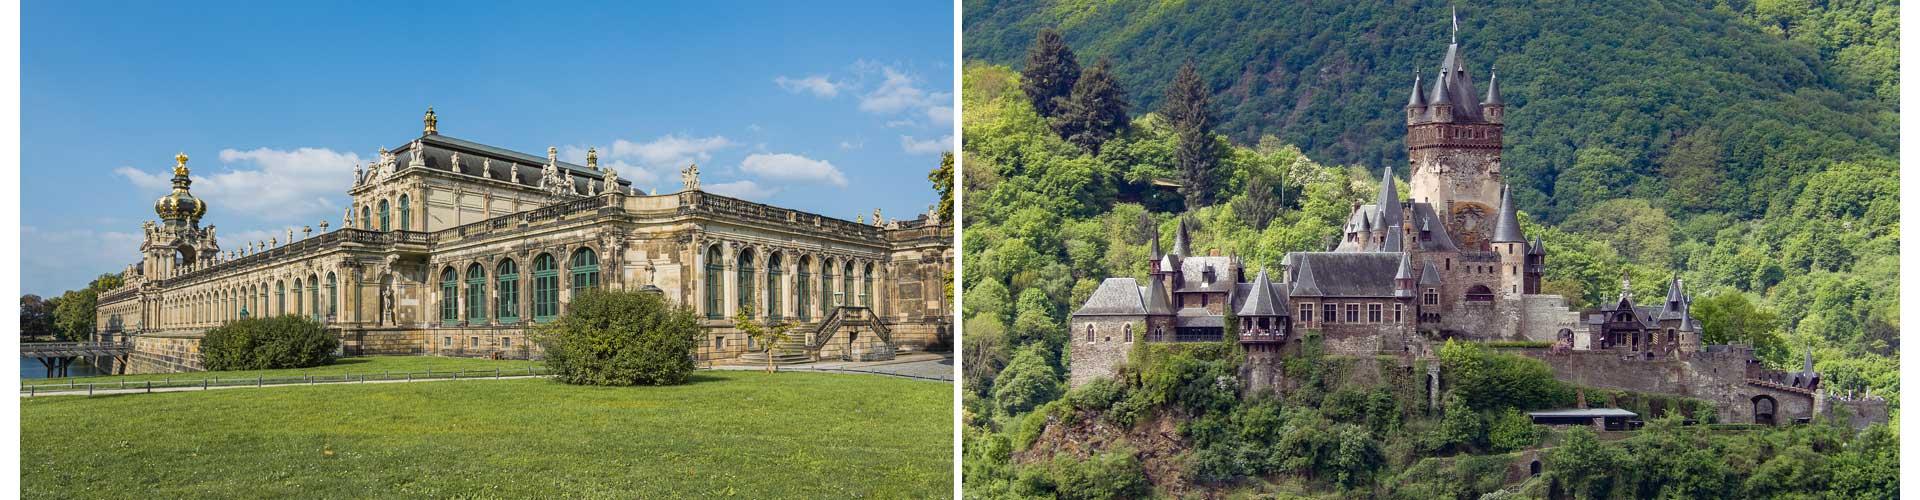 Doppelbild reisetagebuch deutschland selberschreiben mosel dresden zwinger schloss barock